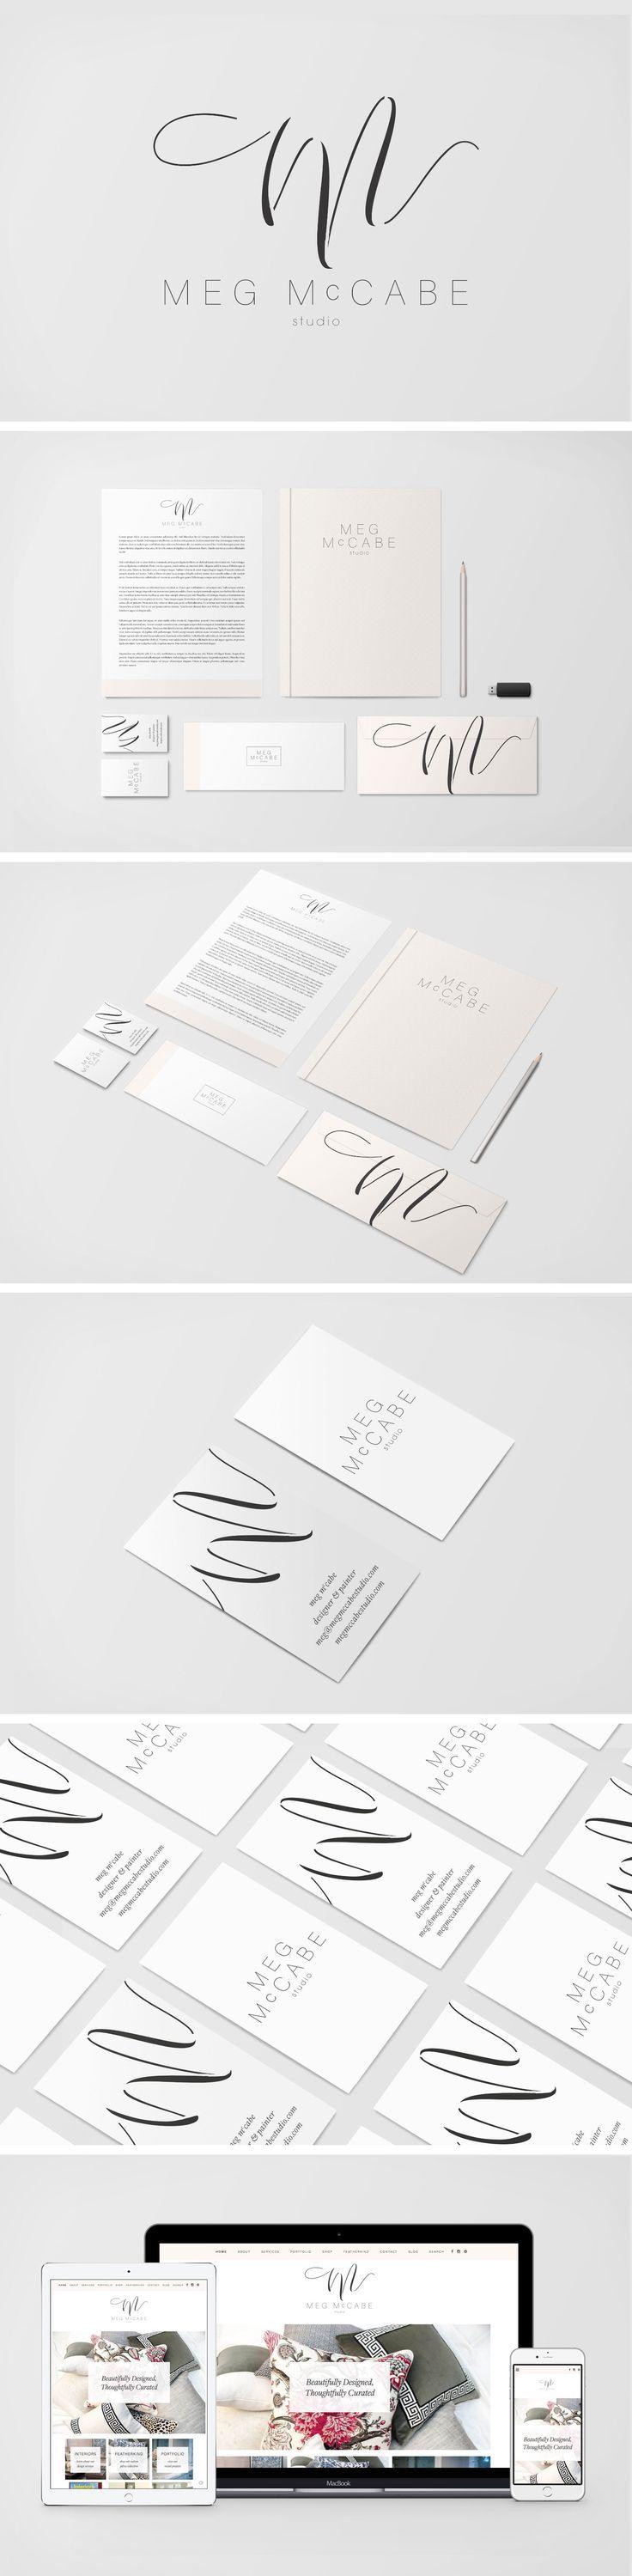 Brand Identity and Logo Design for Meg McCabe Studio